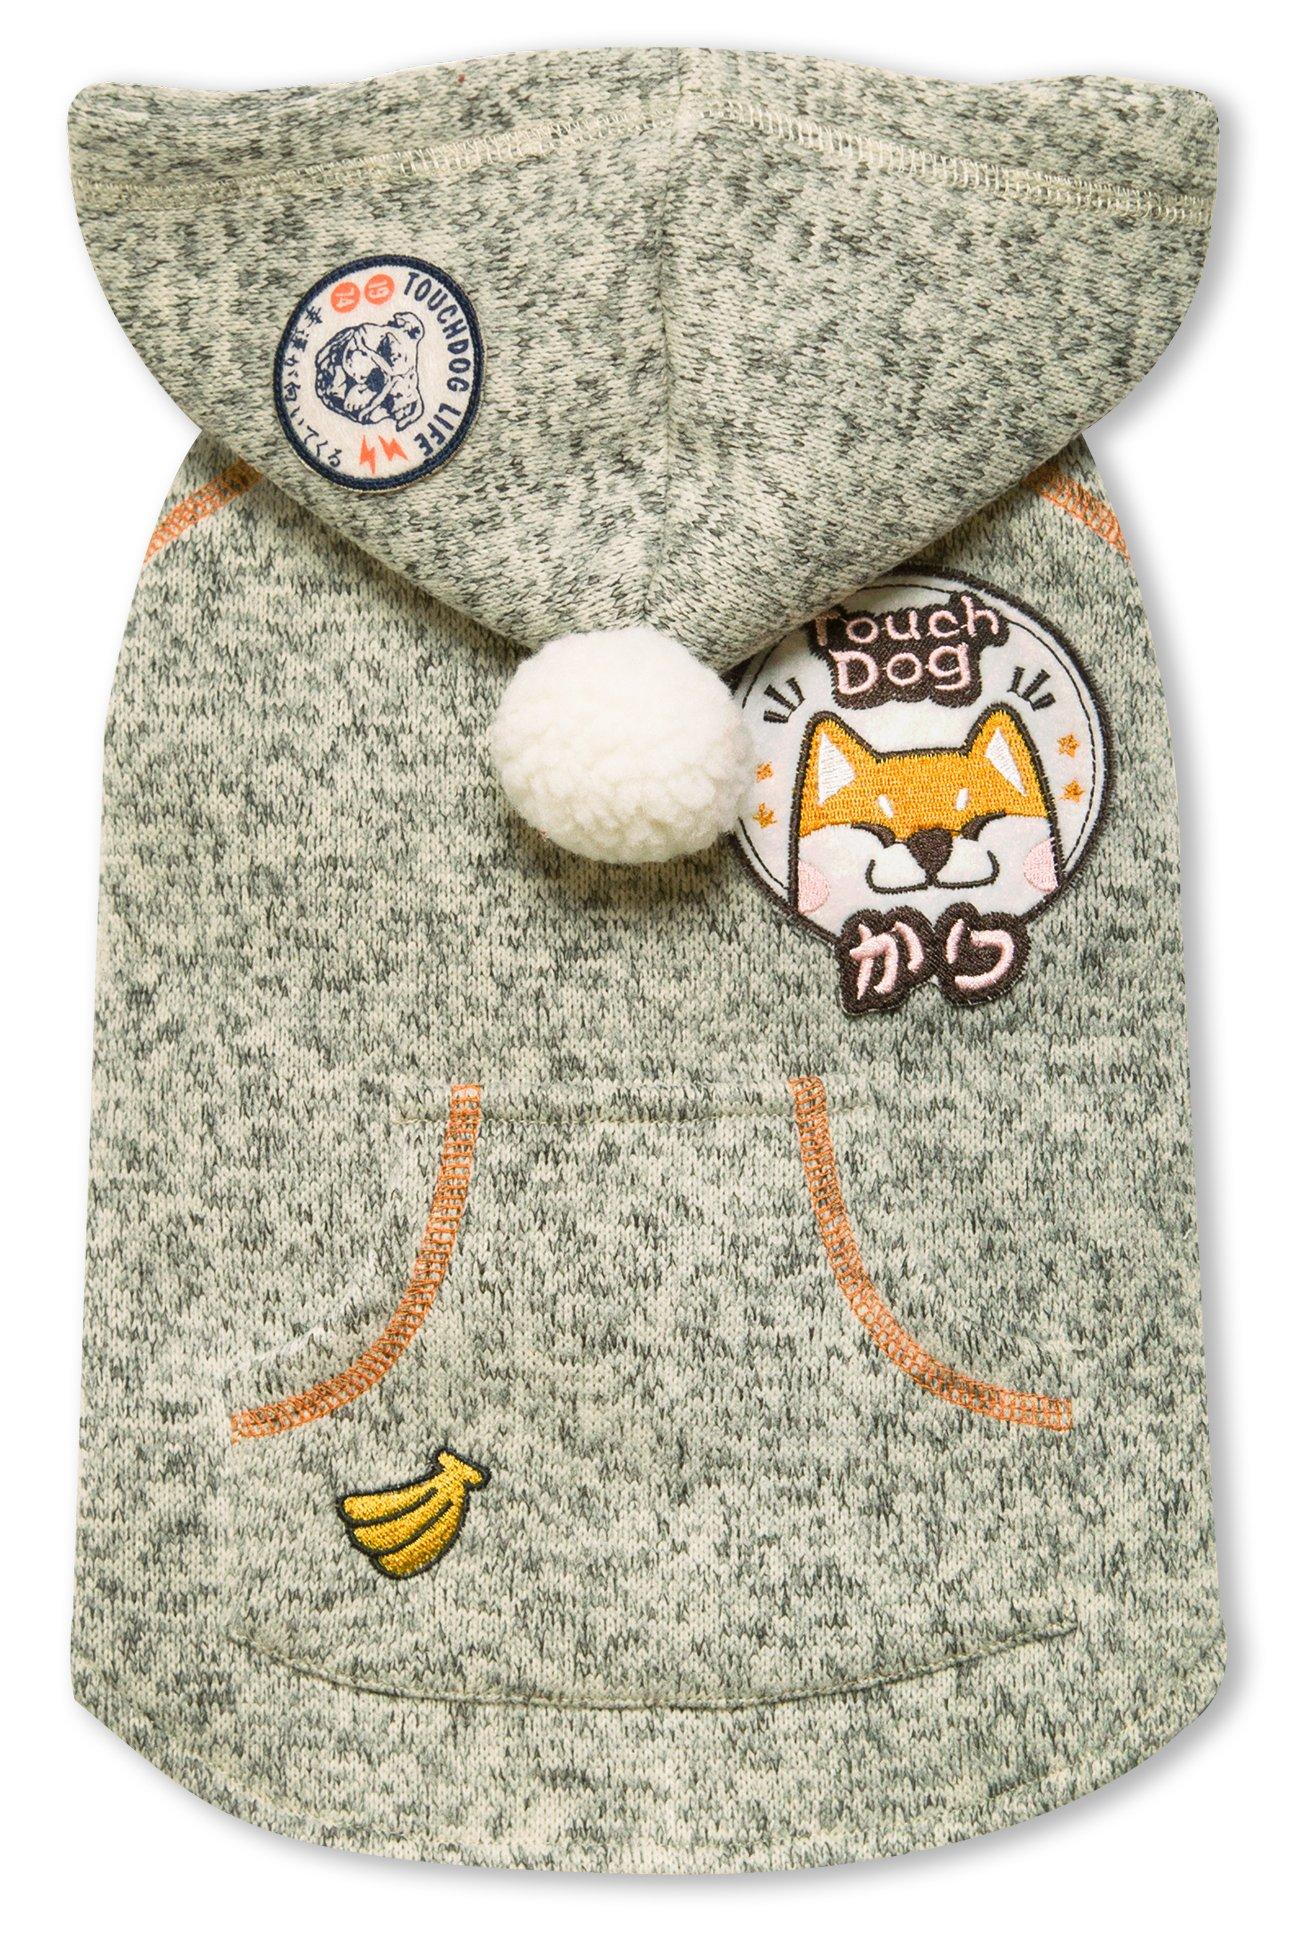 touchdog Hippie Swag' Sleeveless Pompom Designer Fashion Pet Dog Sweater Hoodie Jacket Coat, Small, Olive Green